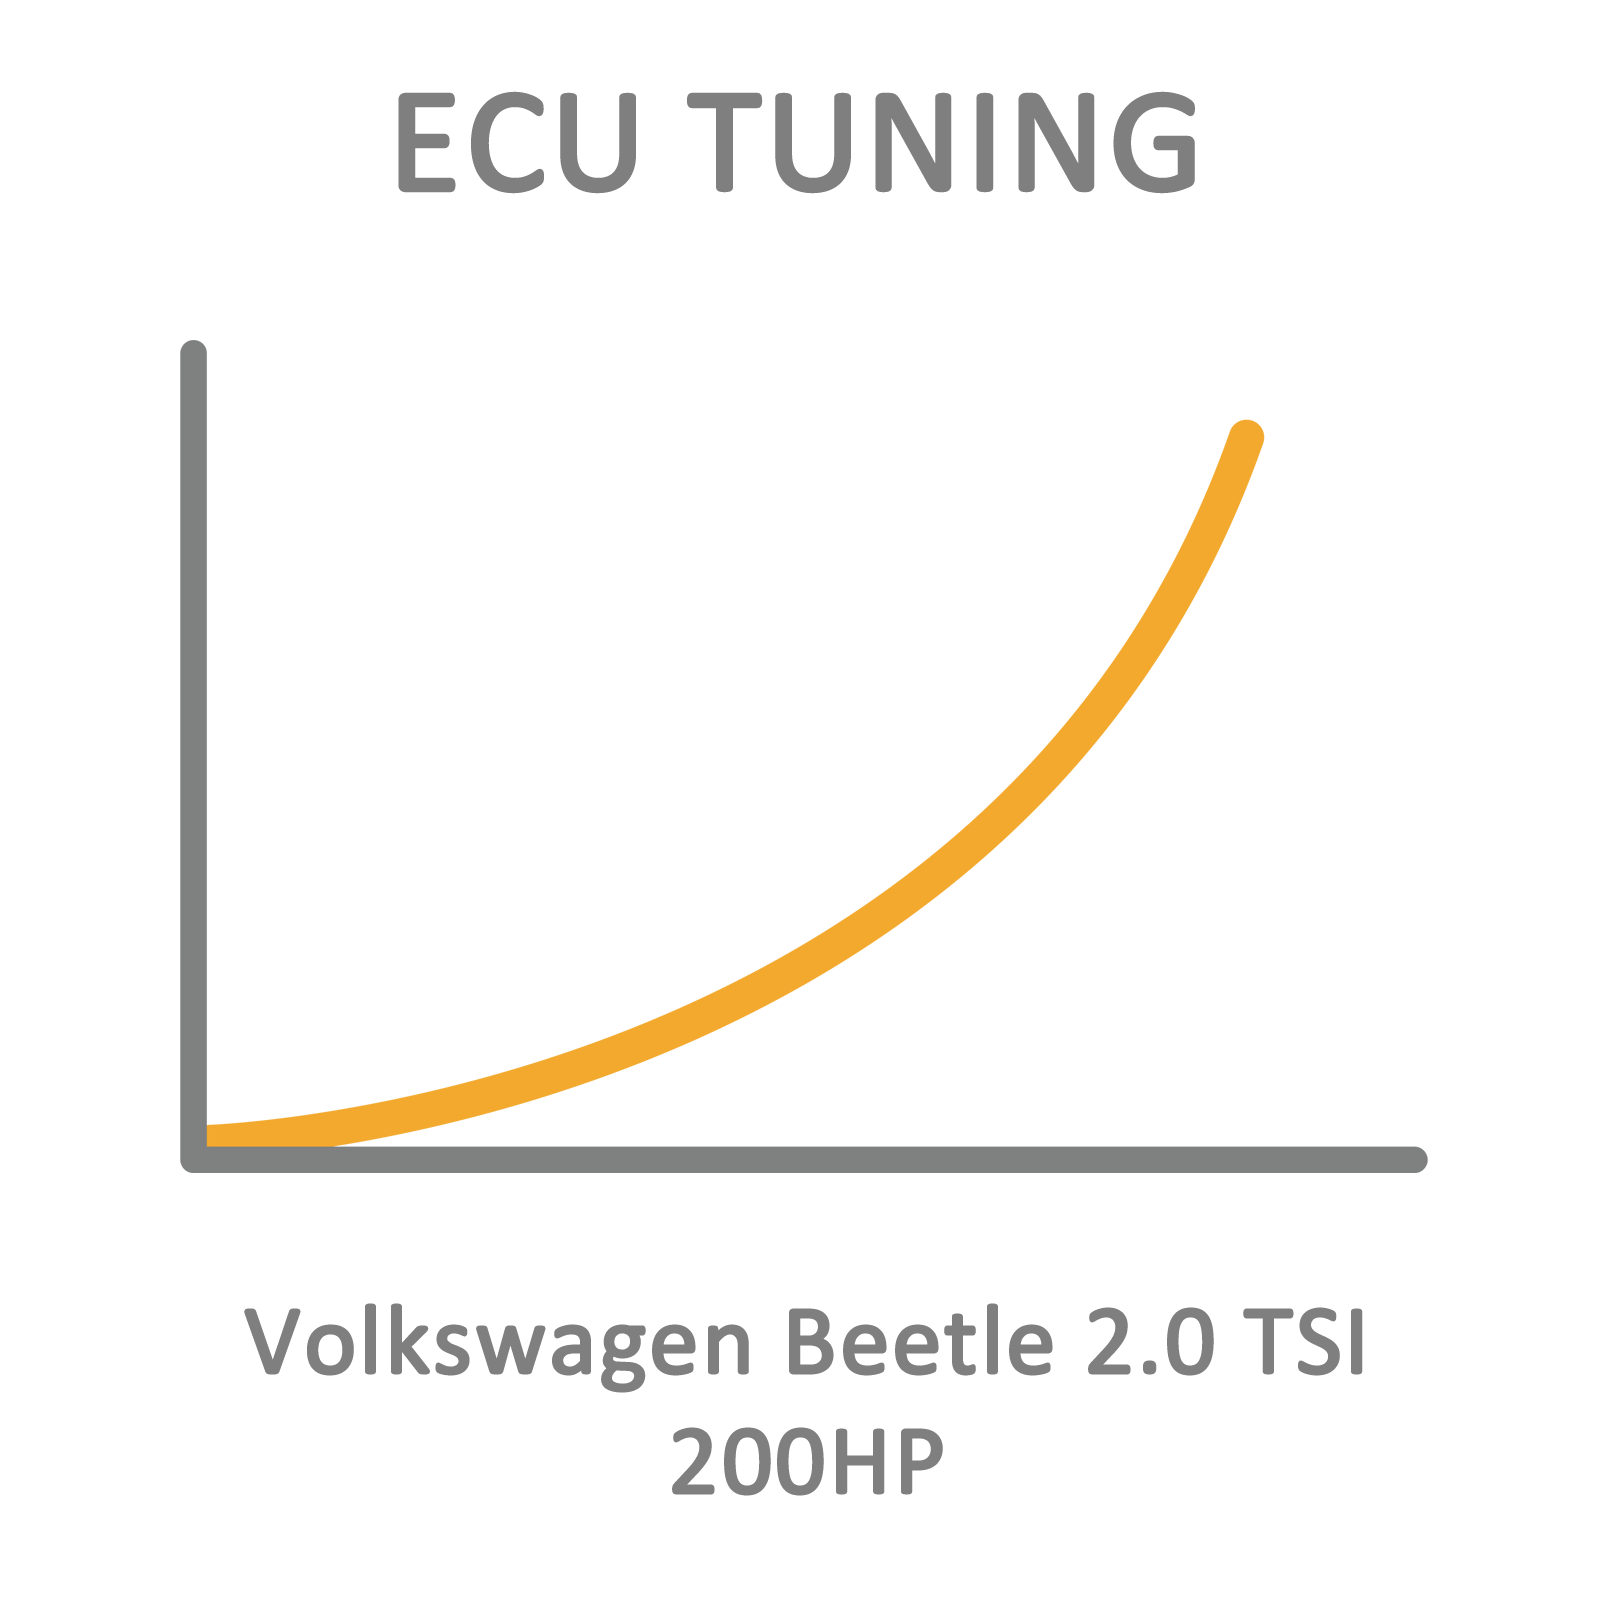 Volkswagen Beetle 2.0 TSI 200HP ECU Tuning Remapping